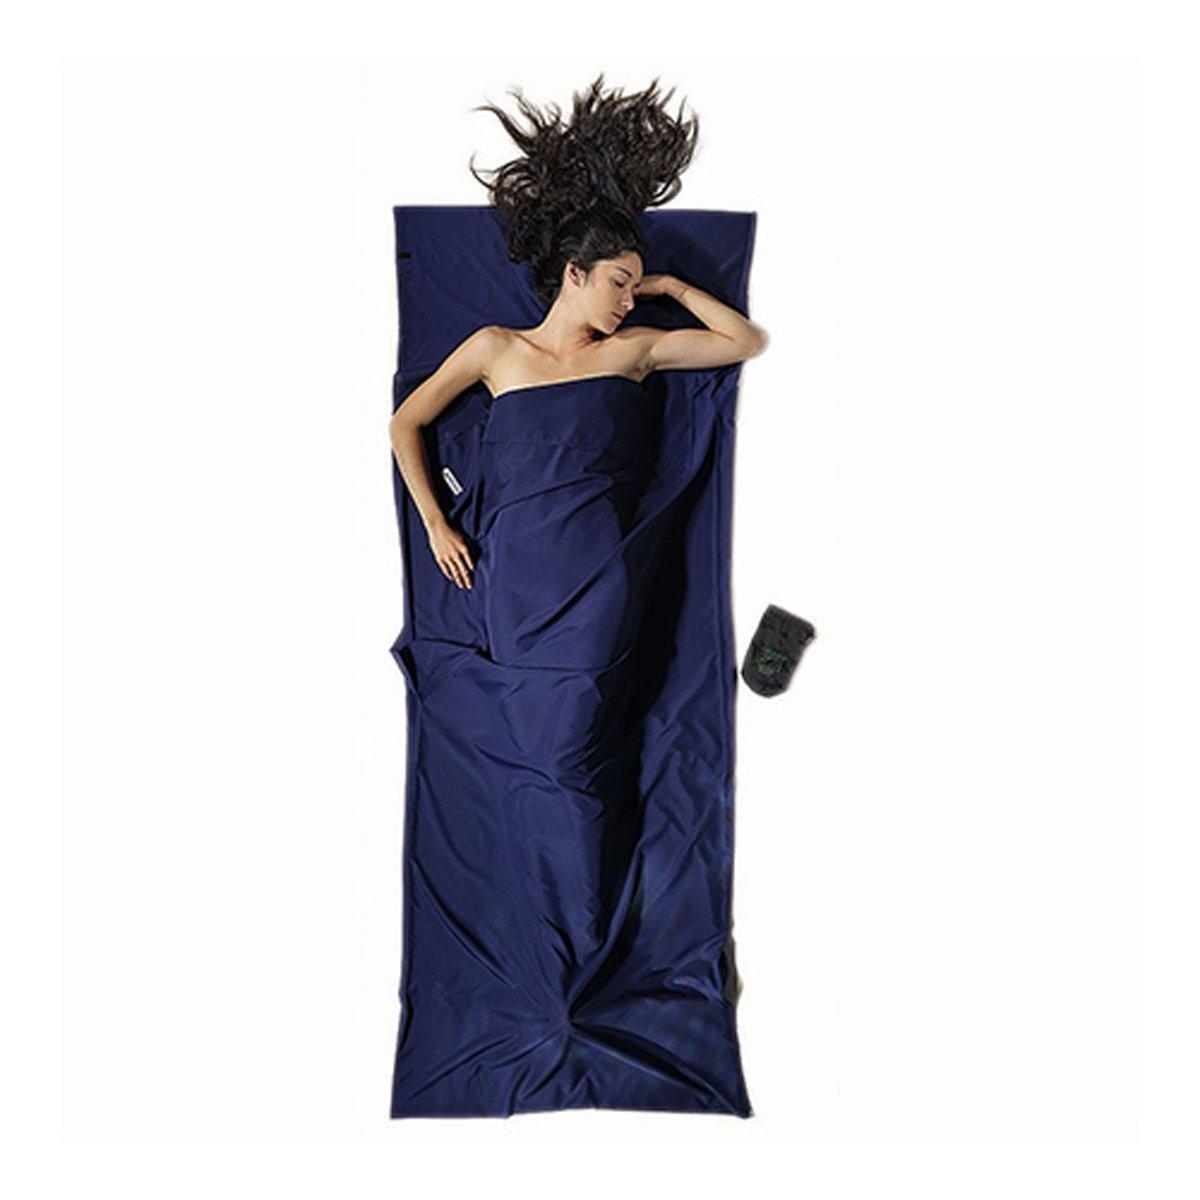 10037; Microfiber TravelSheet, Season-season: summer sleeping bag By Cocoon